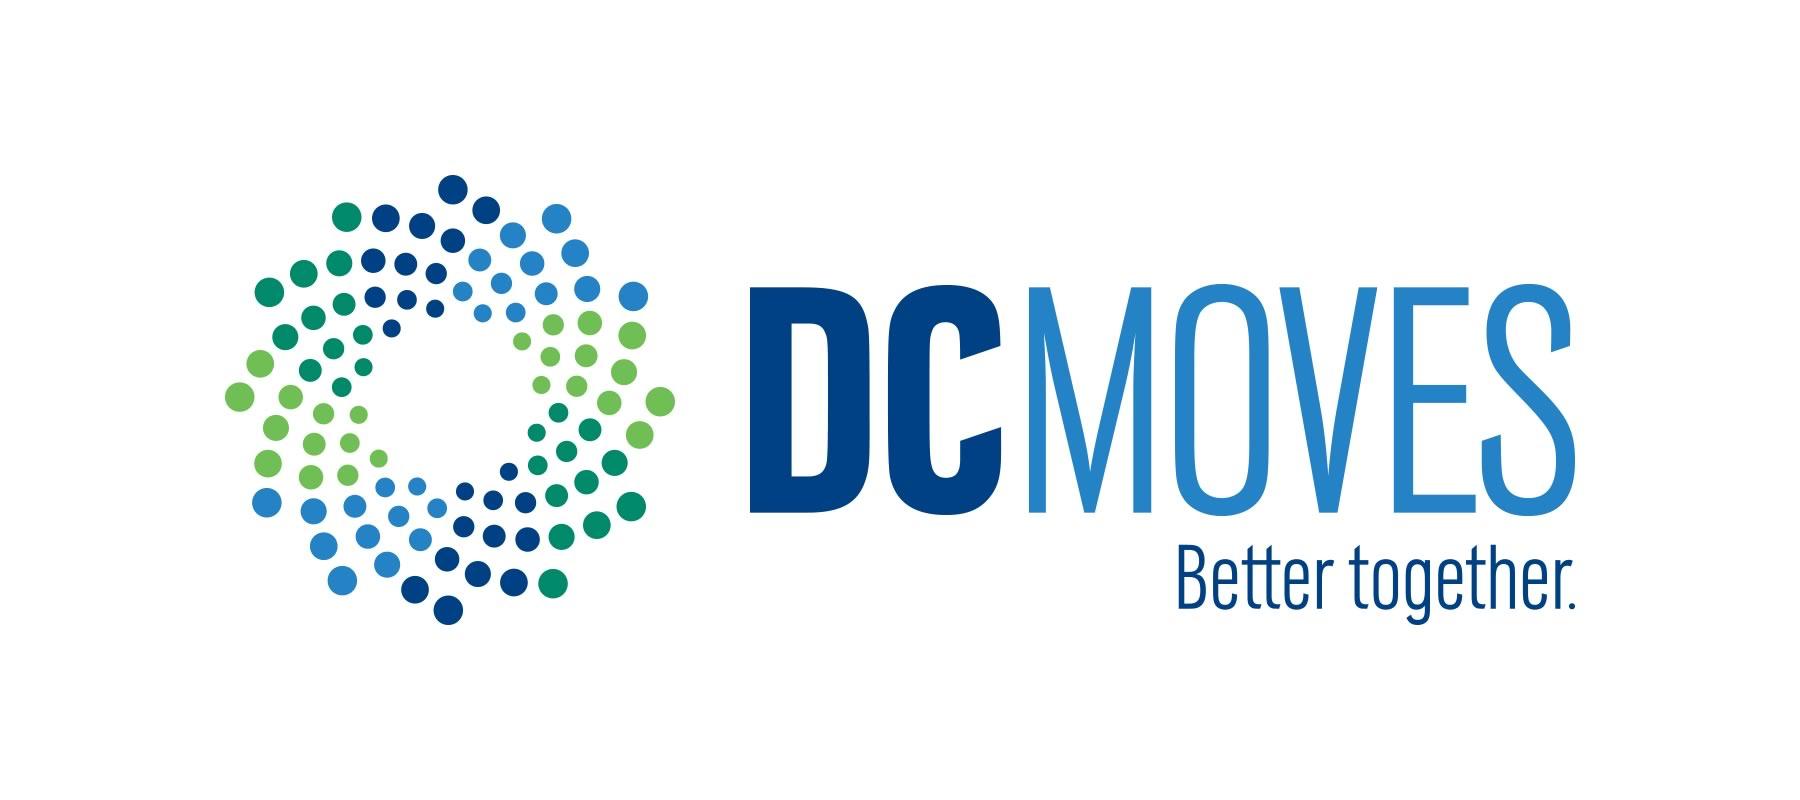 DC MOVES Better together